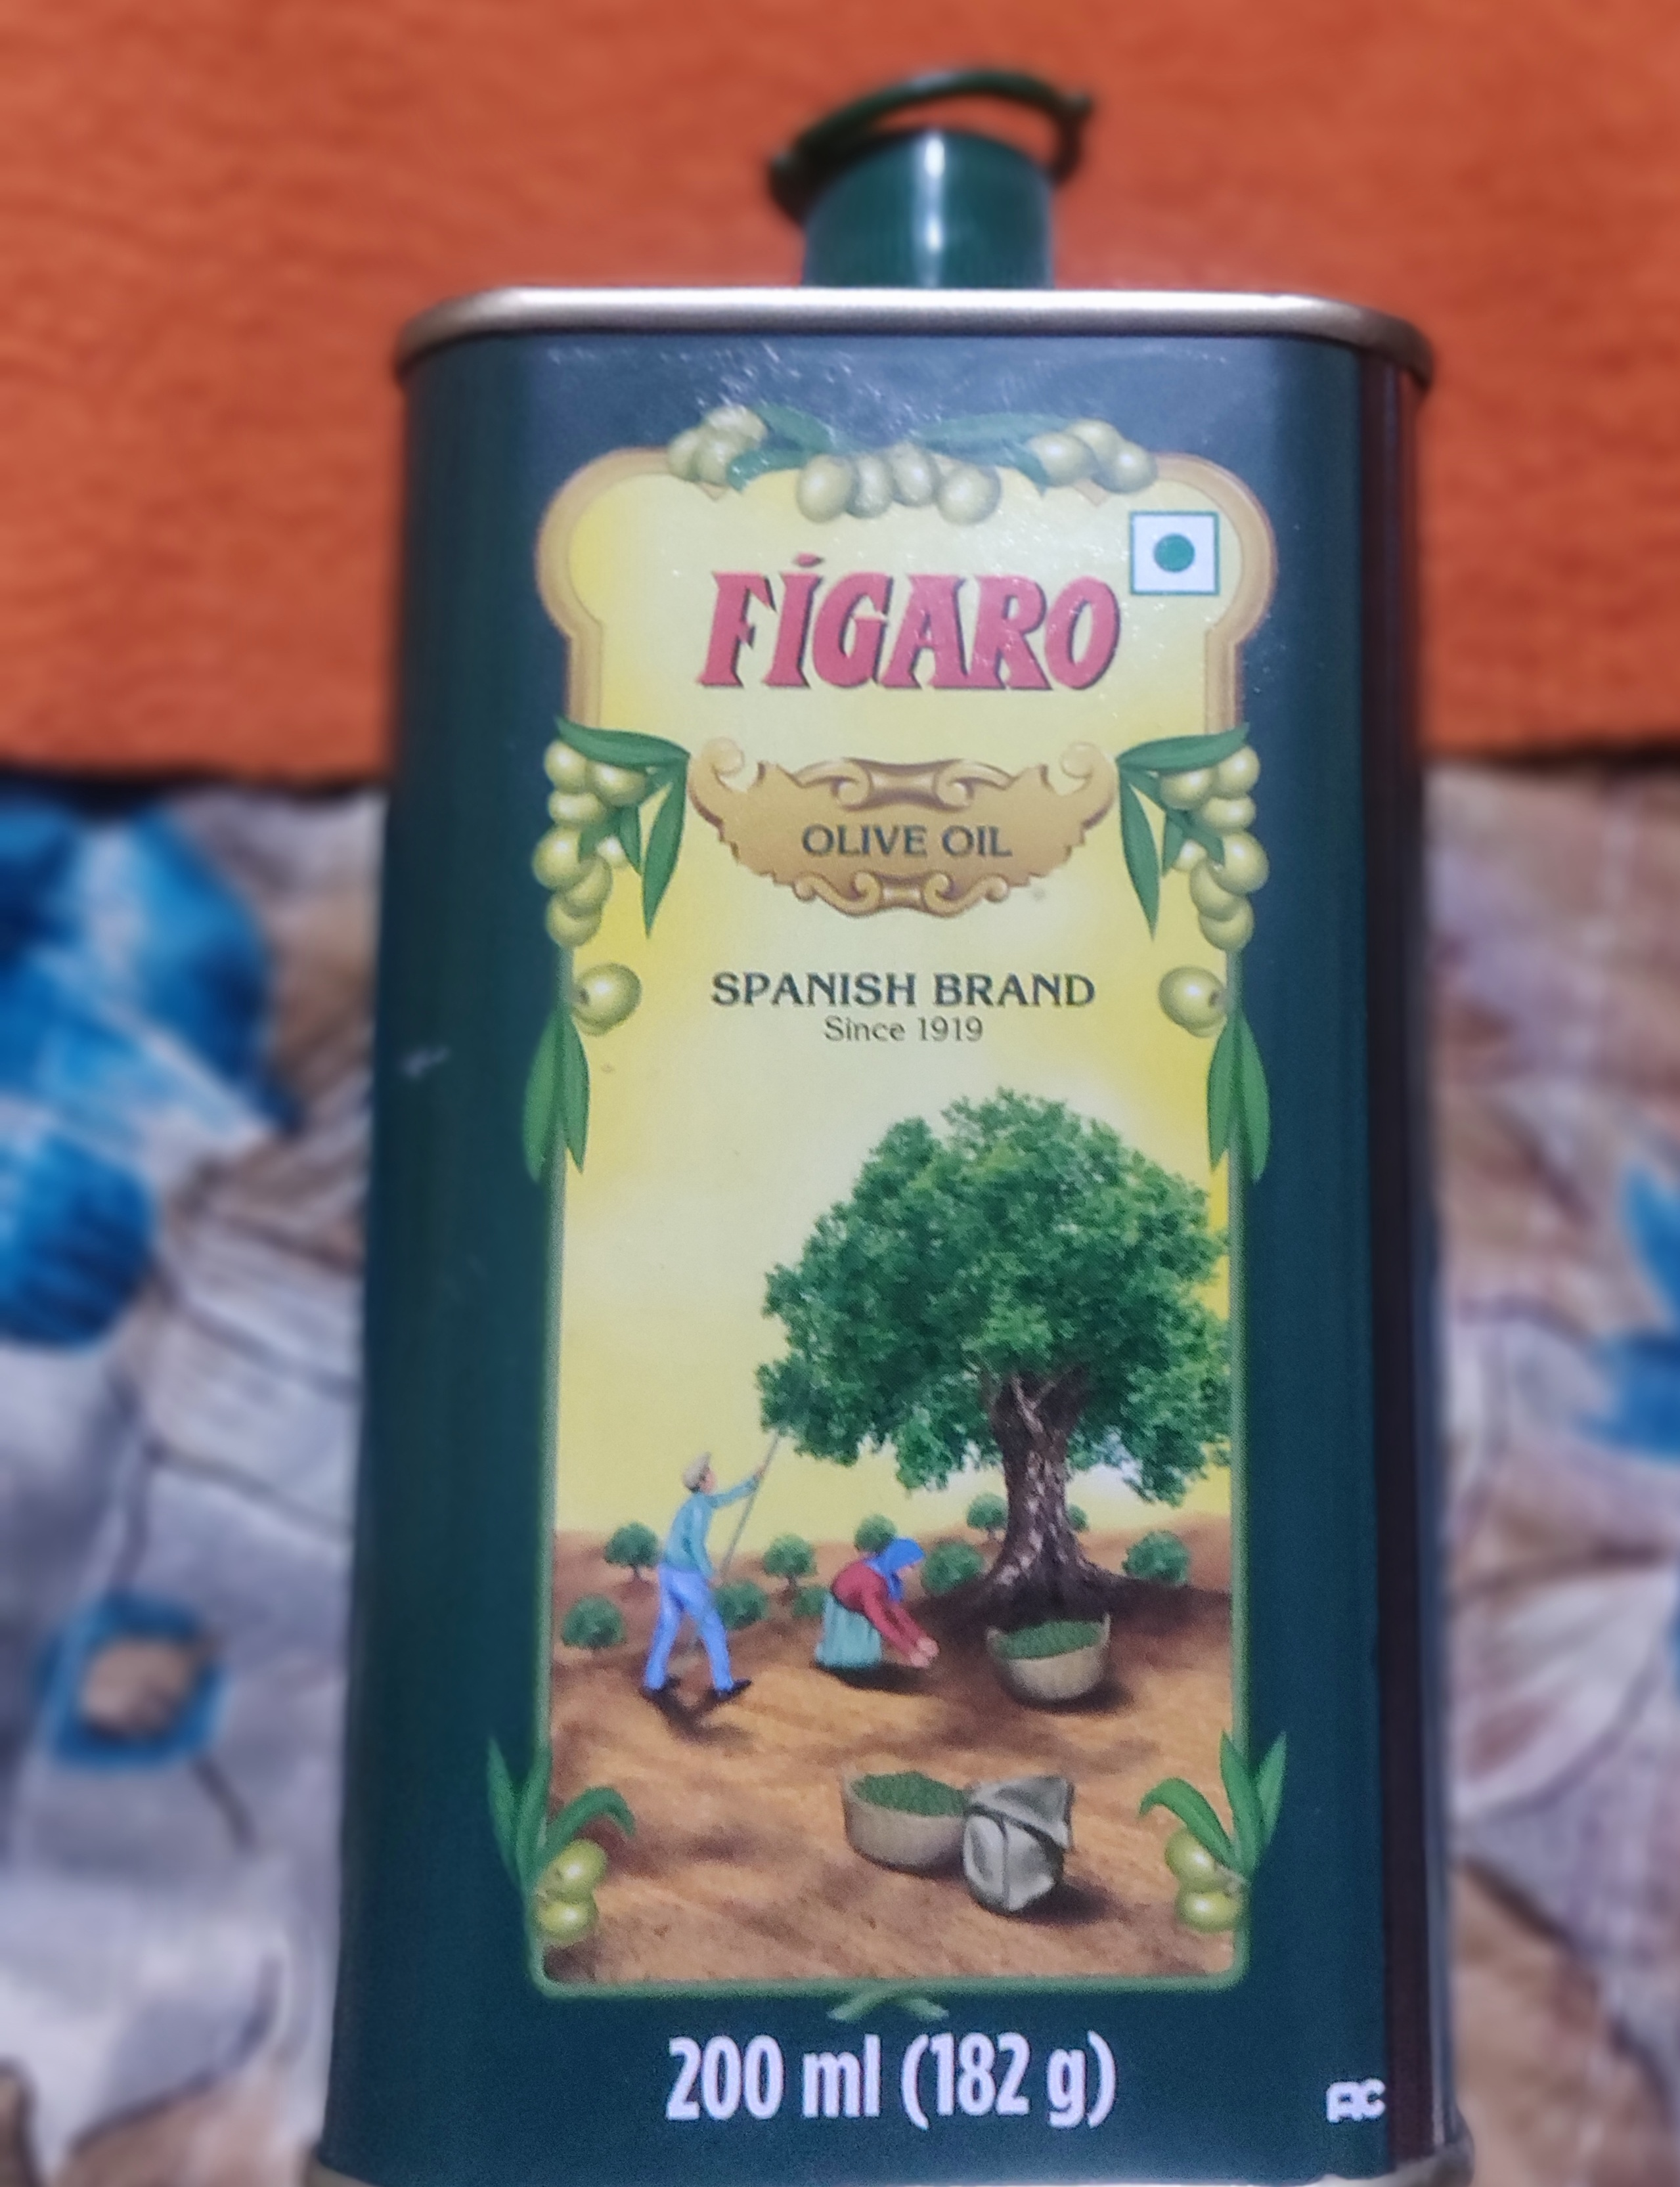 Figaro Baby Massage Olive Oil-Good Product-By harsha_kumari